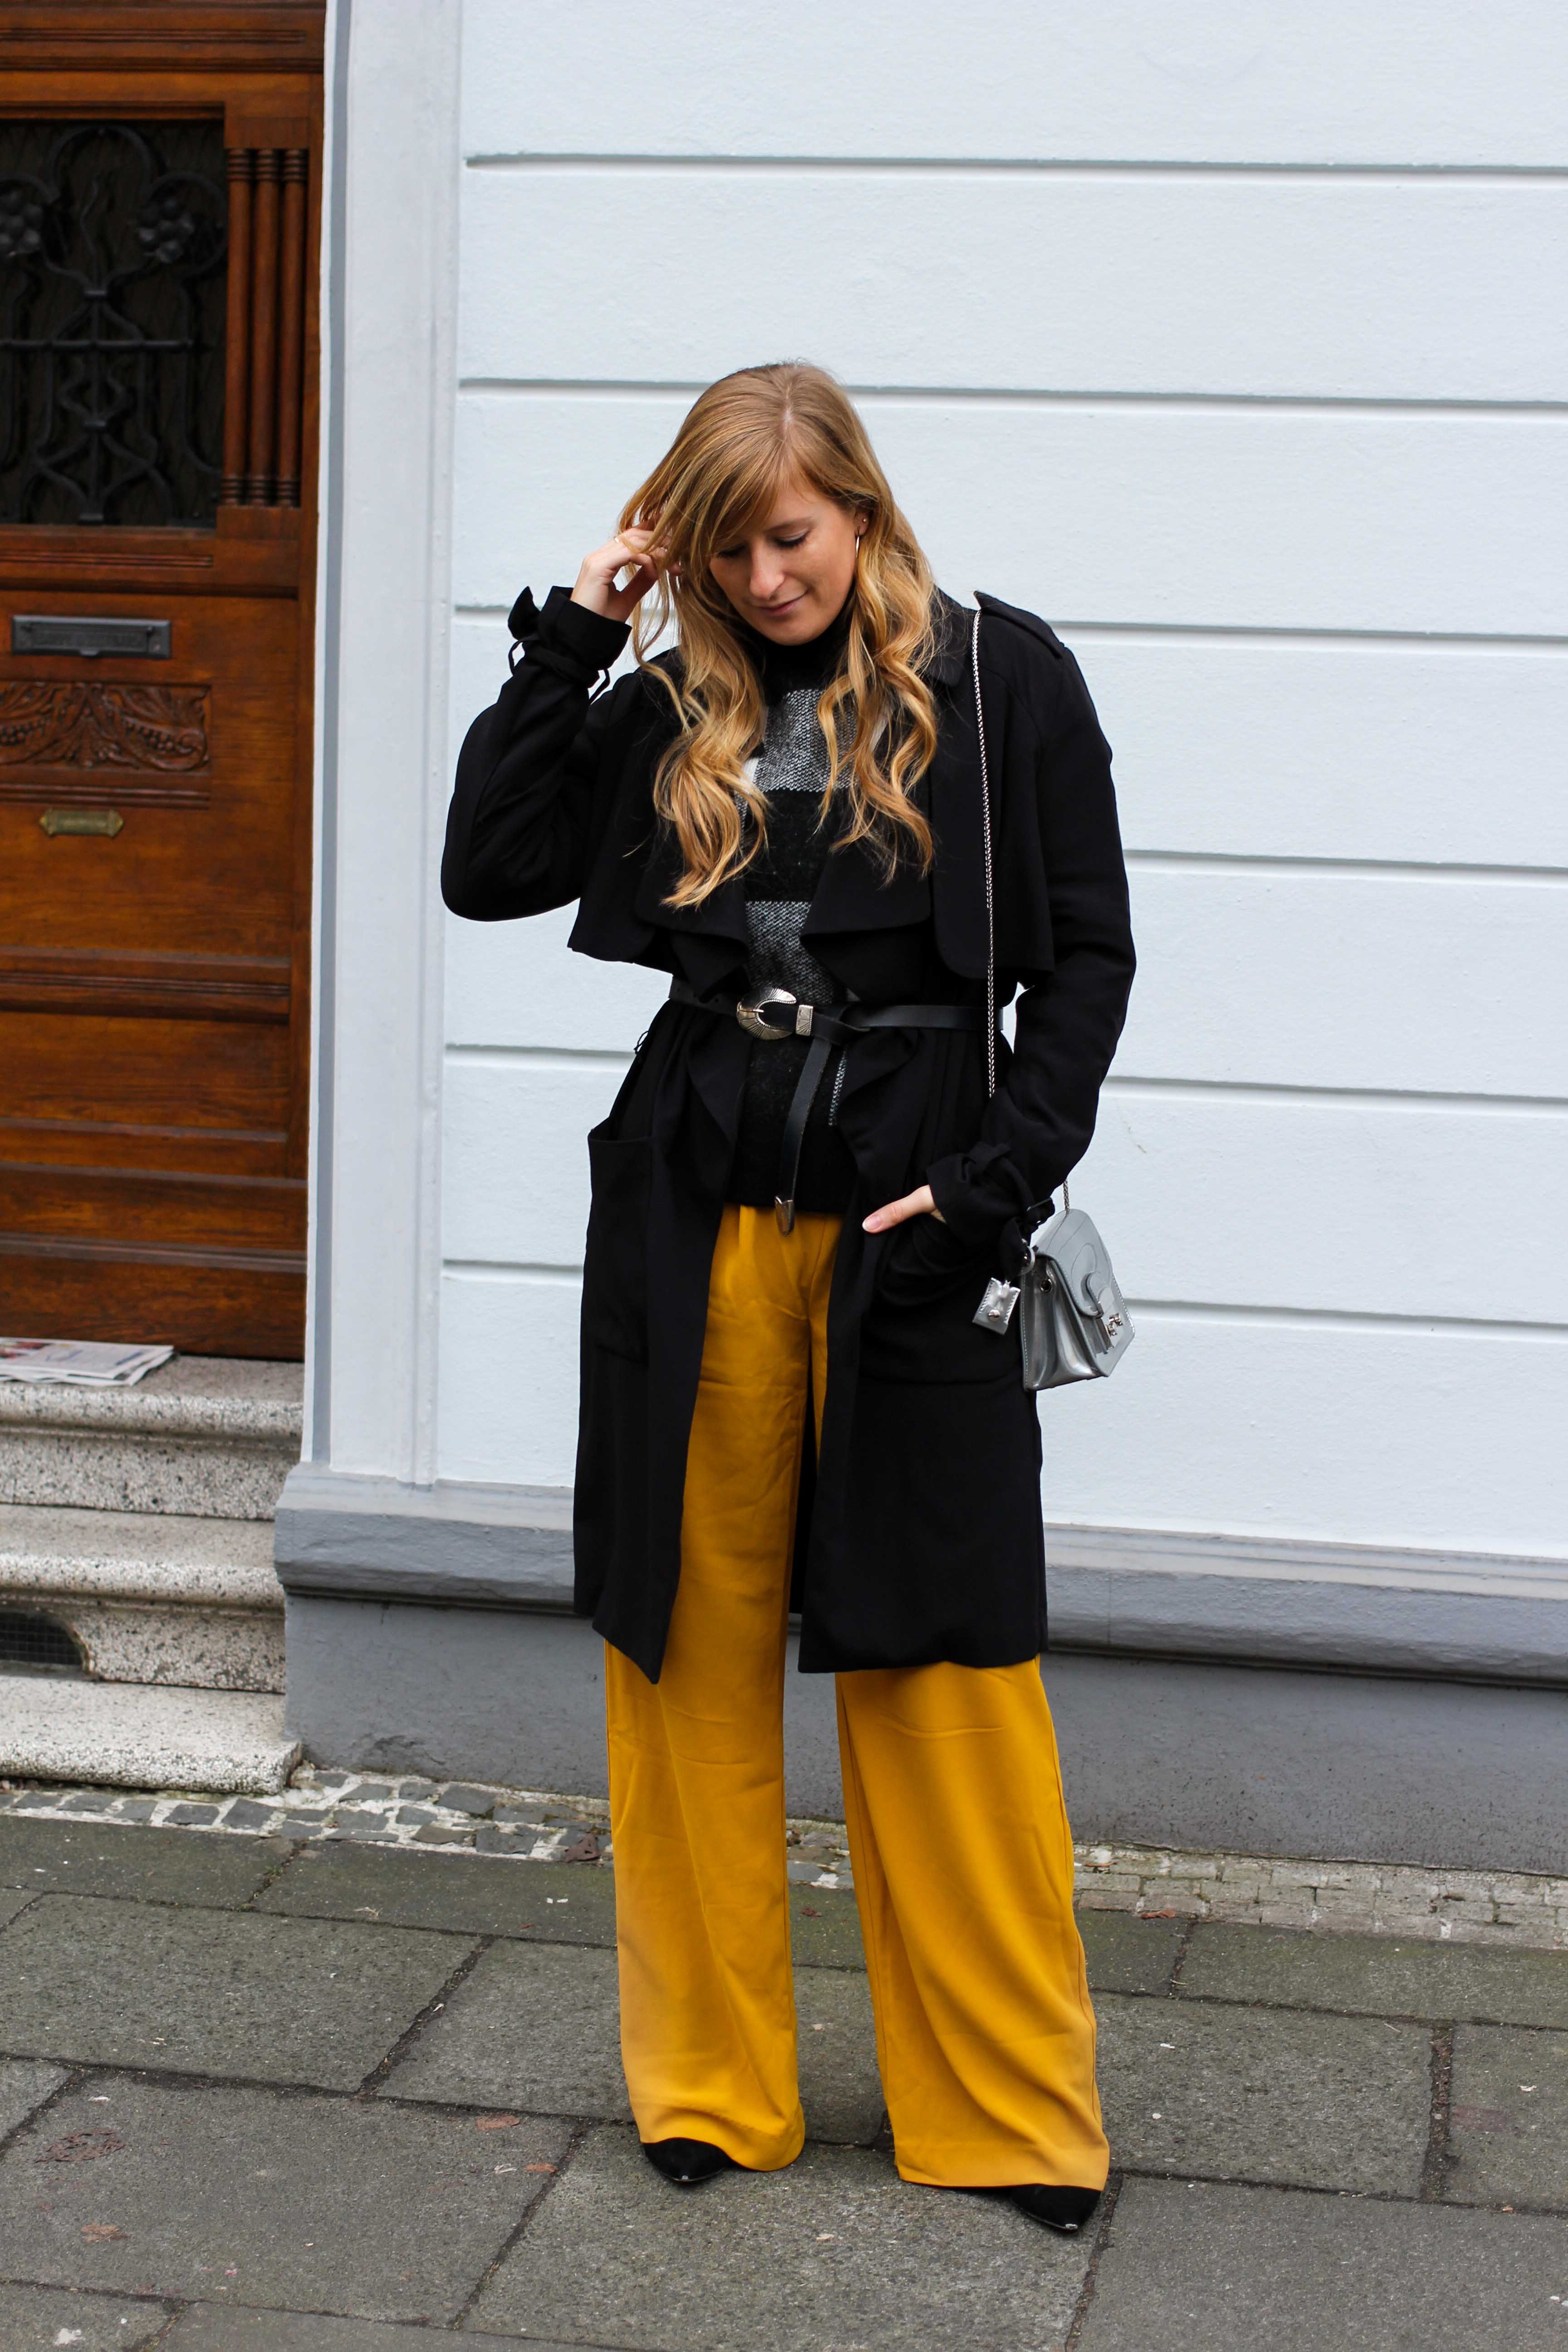 Karo Pullover Wide Leg Pants Gelb Weite Hosen kombinieren Modeblog Outfit Herbst Winter Bonn Blog 1